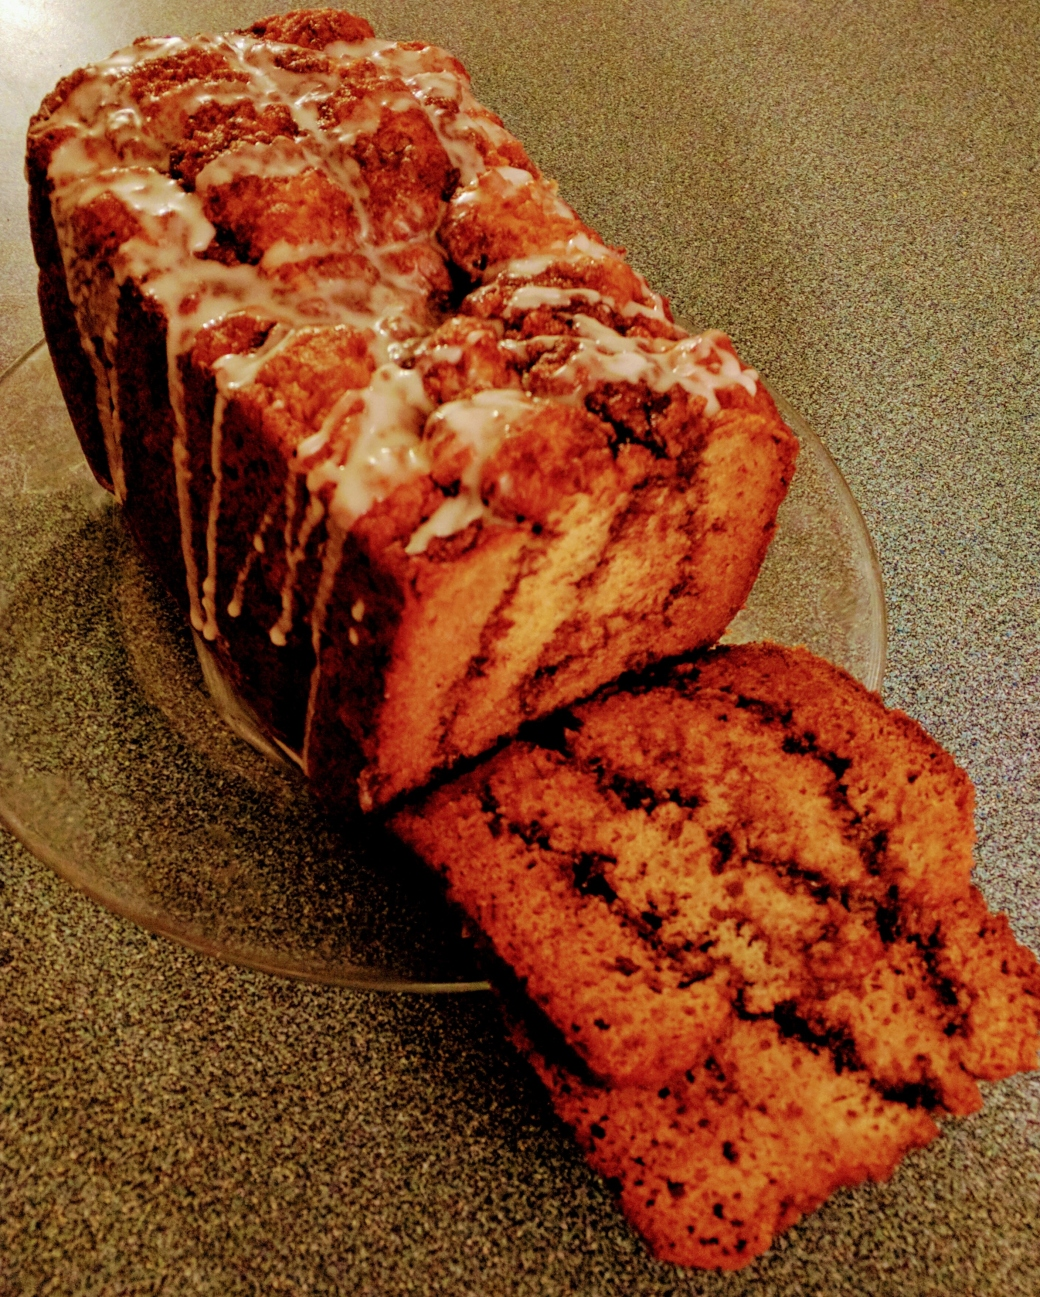 CinnamonRoll Marble Bread2.jpg